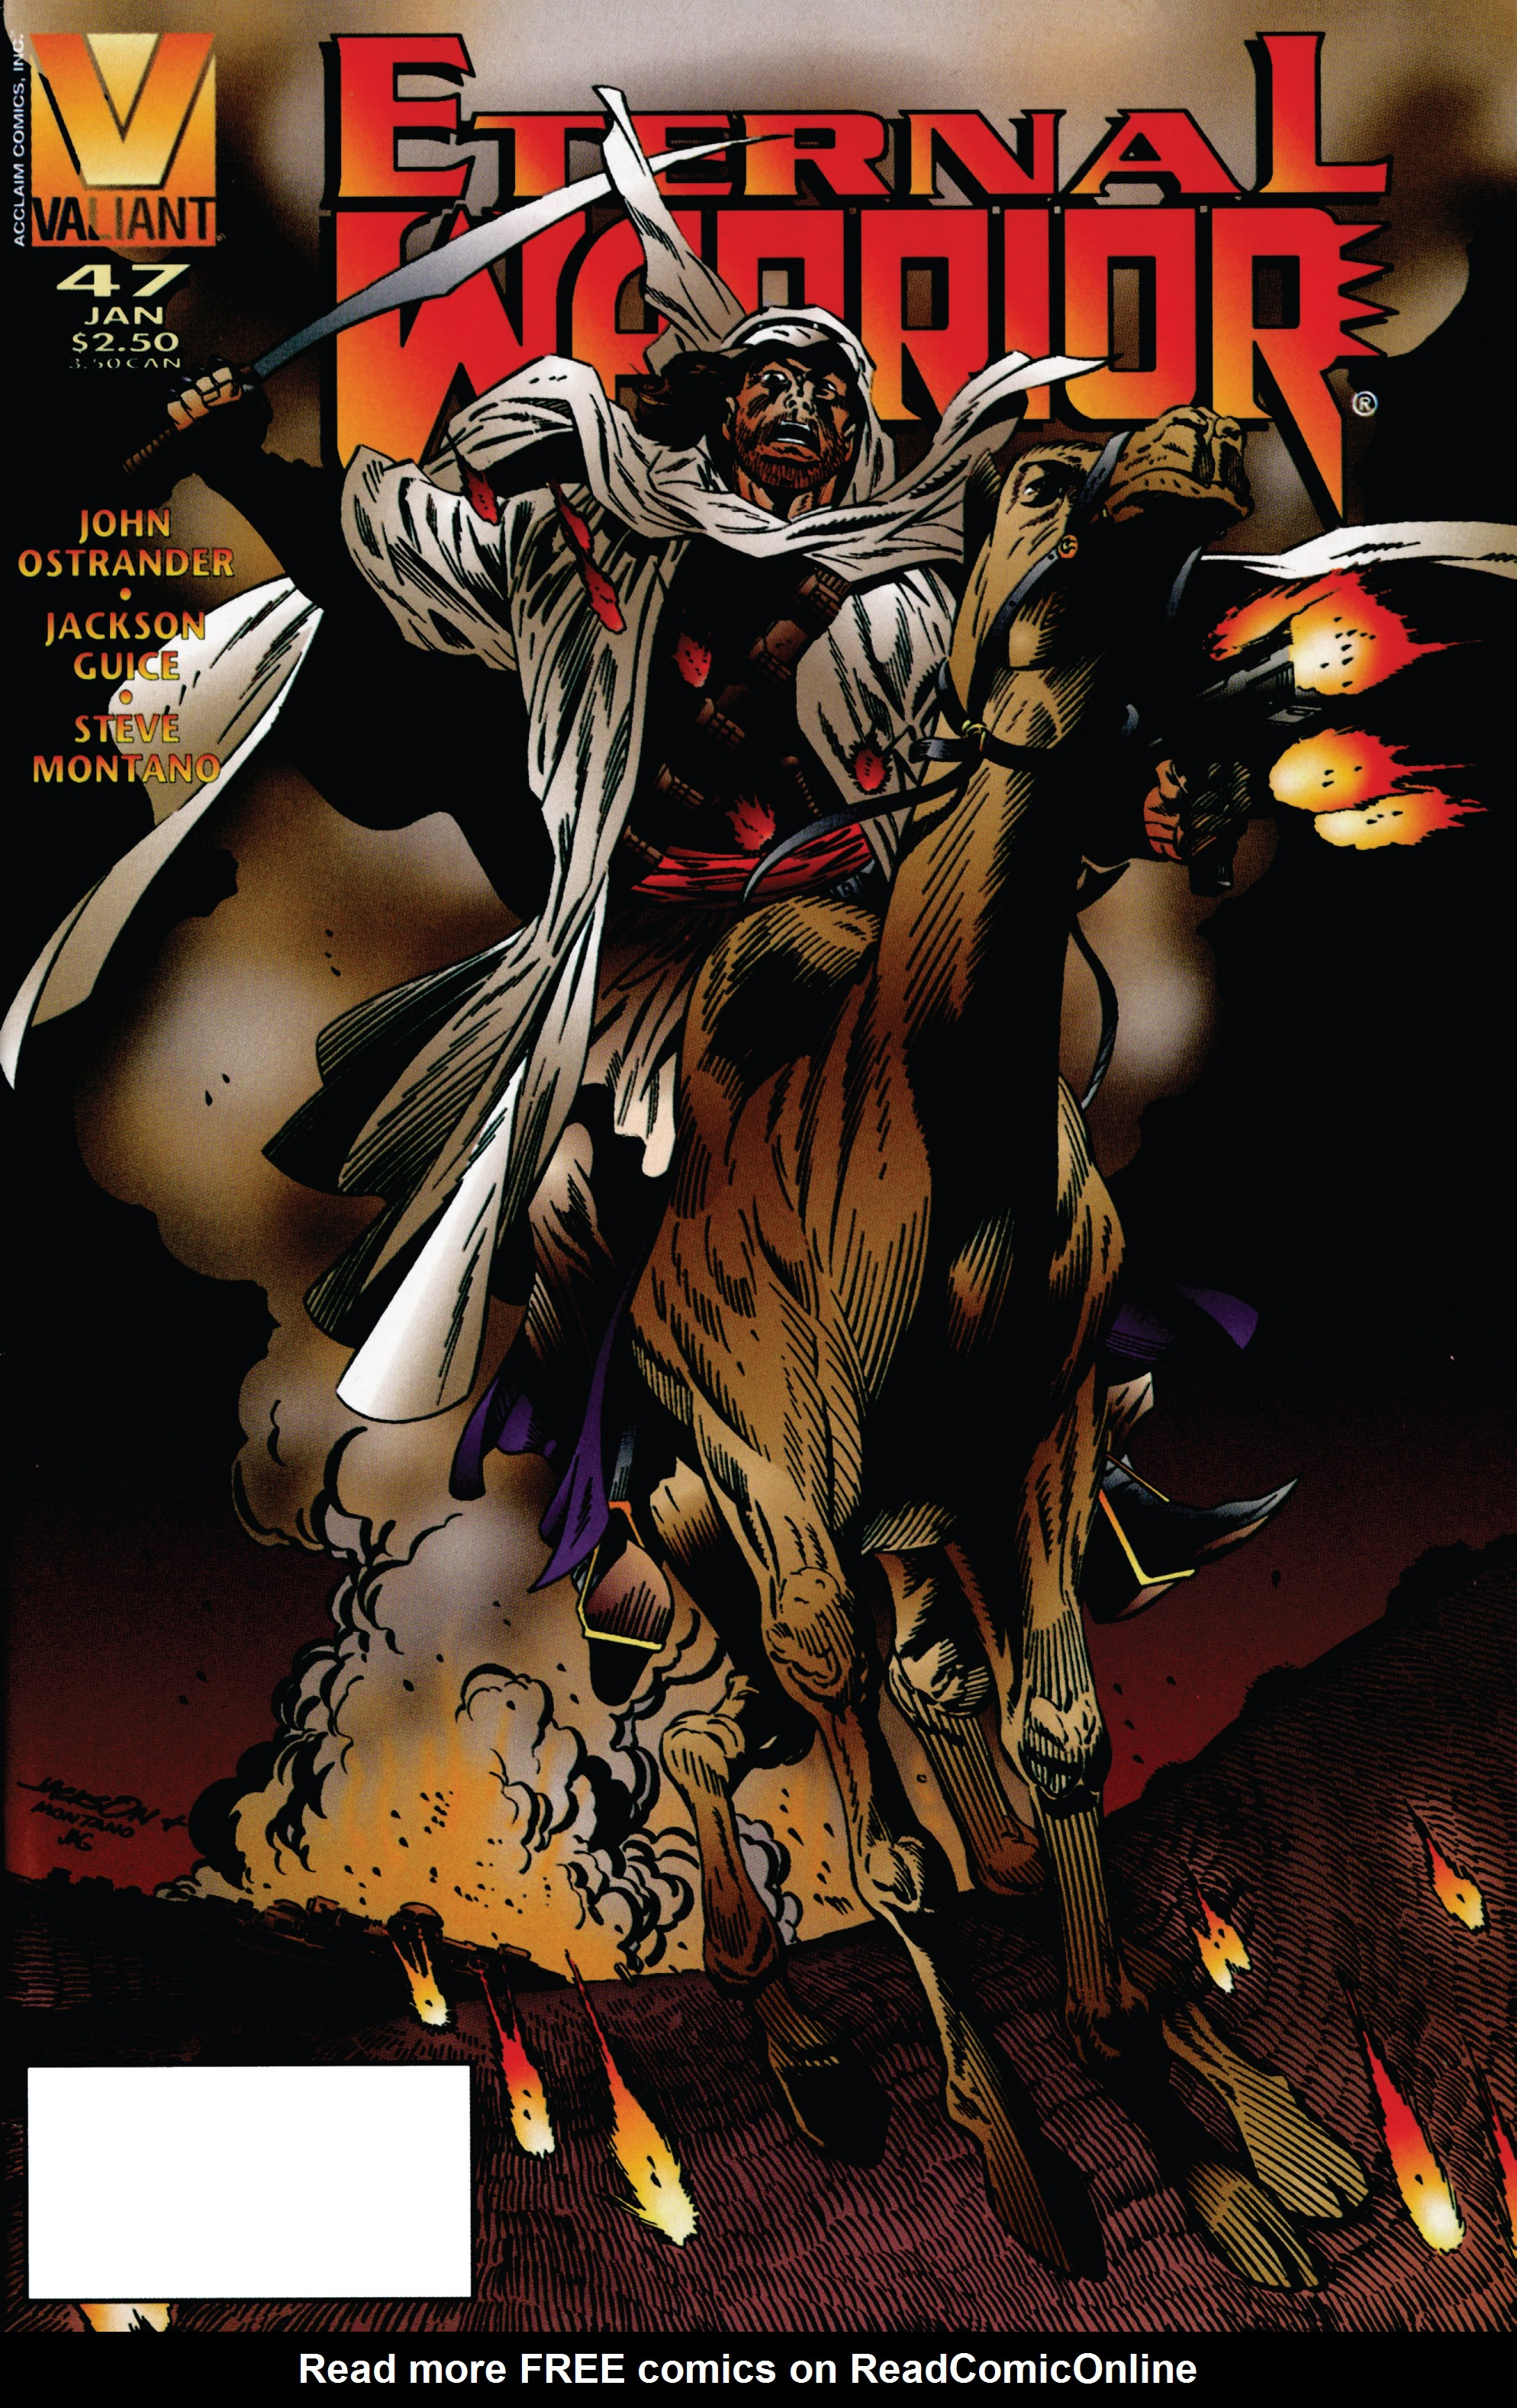 Read online Eternal Warrior (1992) comic -  Issue #47 - 1